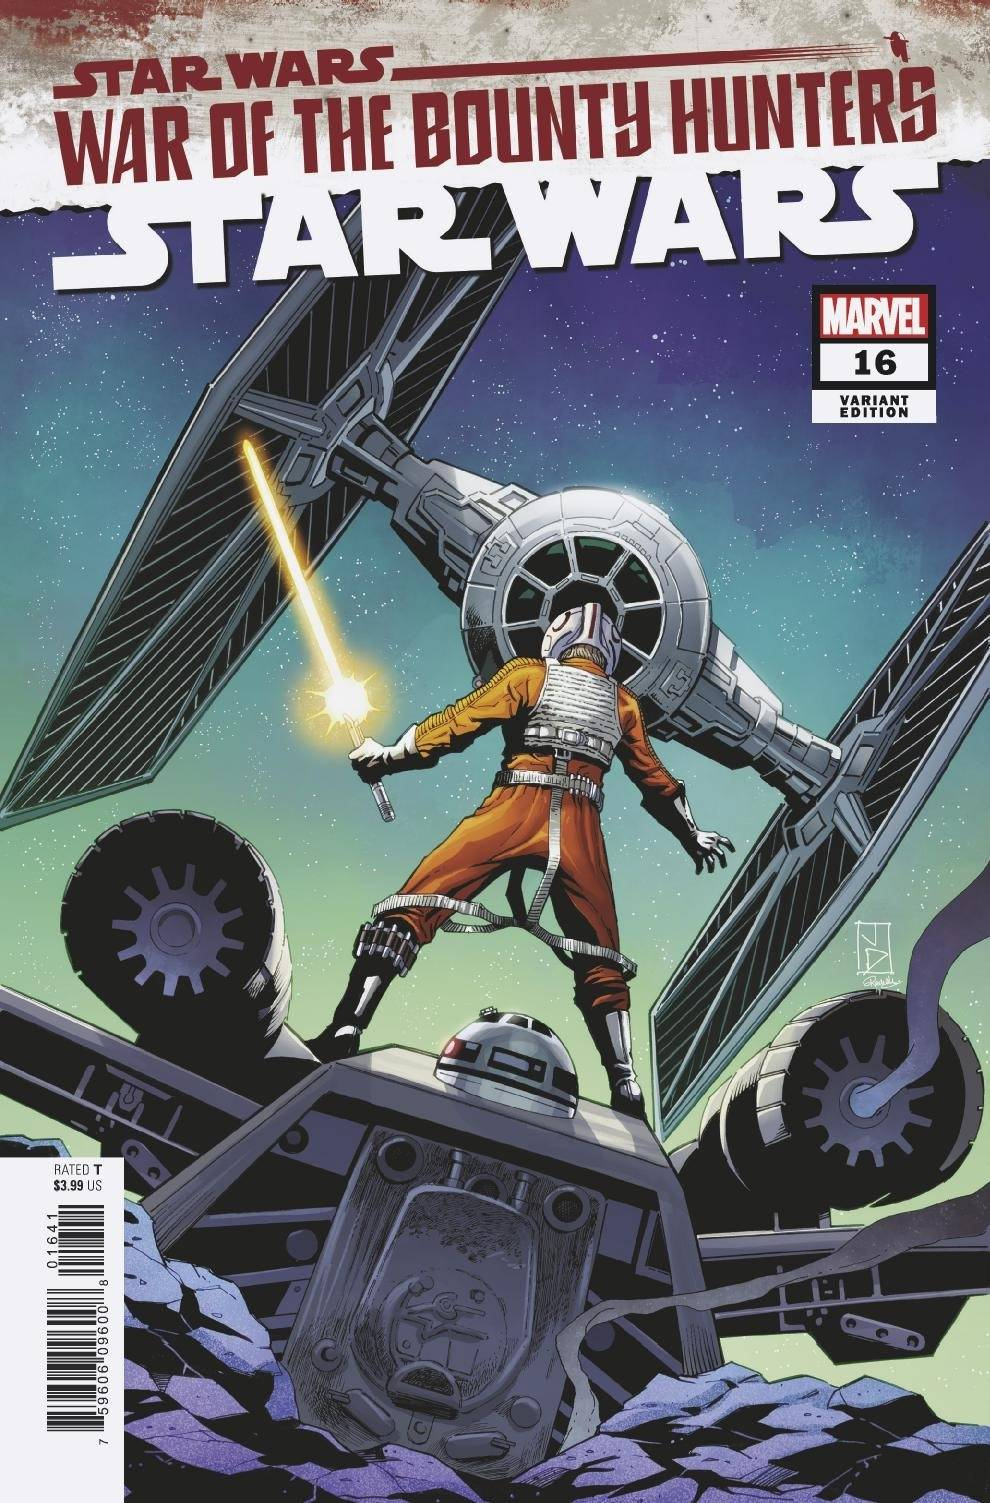 Star Wars #16 (Jan Duursema Variant Cover) (18.08.2021)